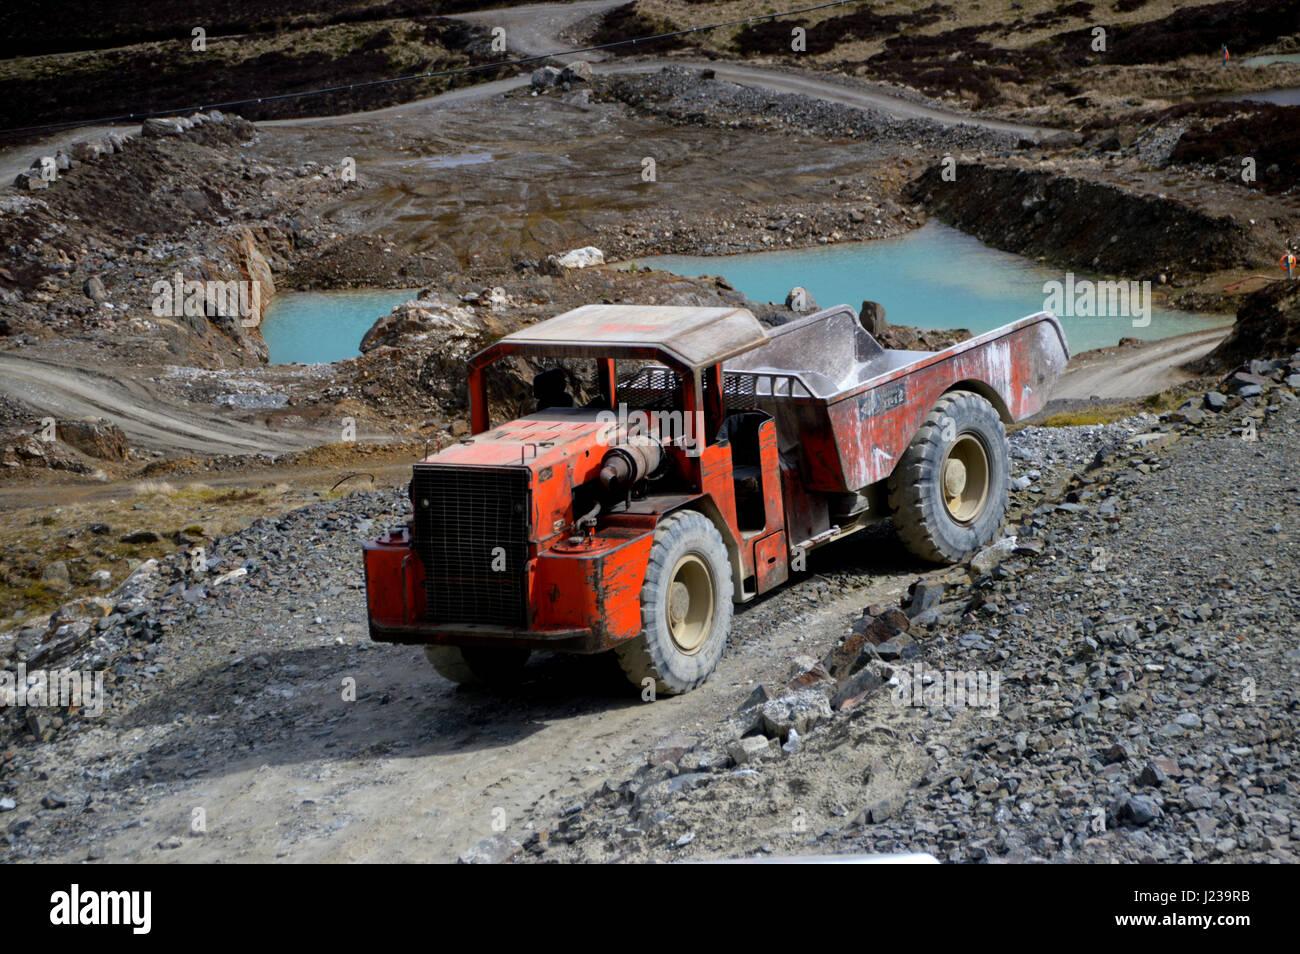 Underground Dumper Truck use during Mining Operations at Foss Barytes Mine near Aberfeldy, Below the Scottish Mountain - Stock Image